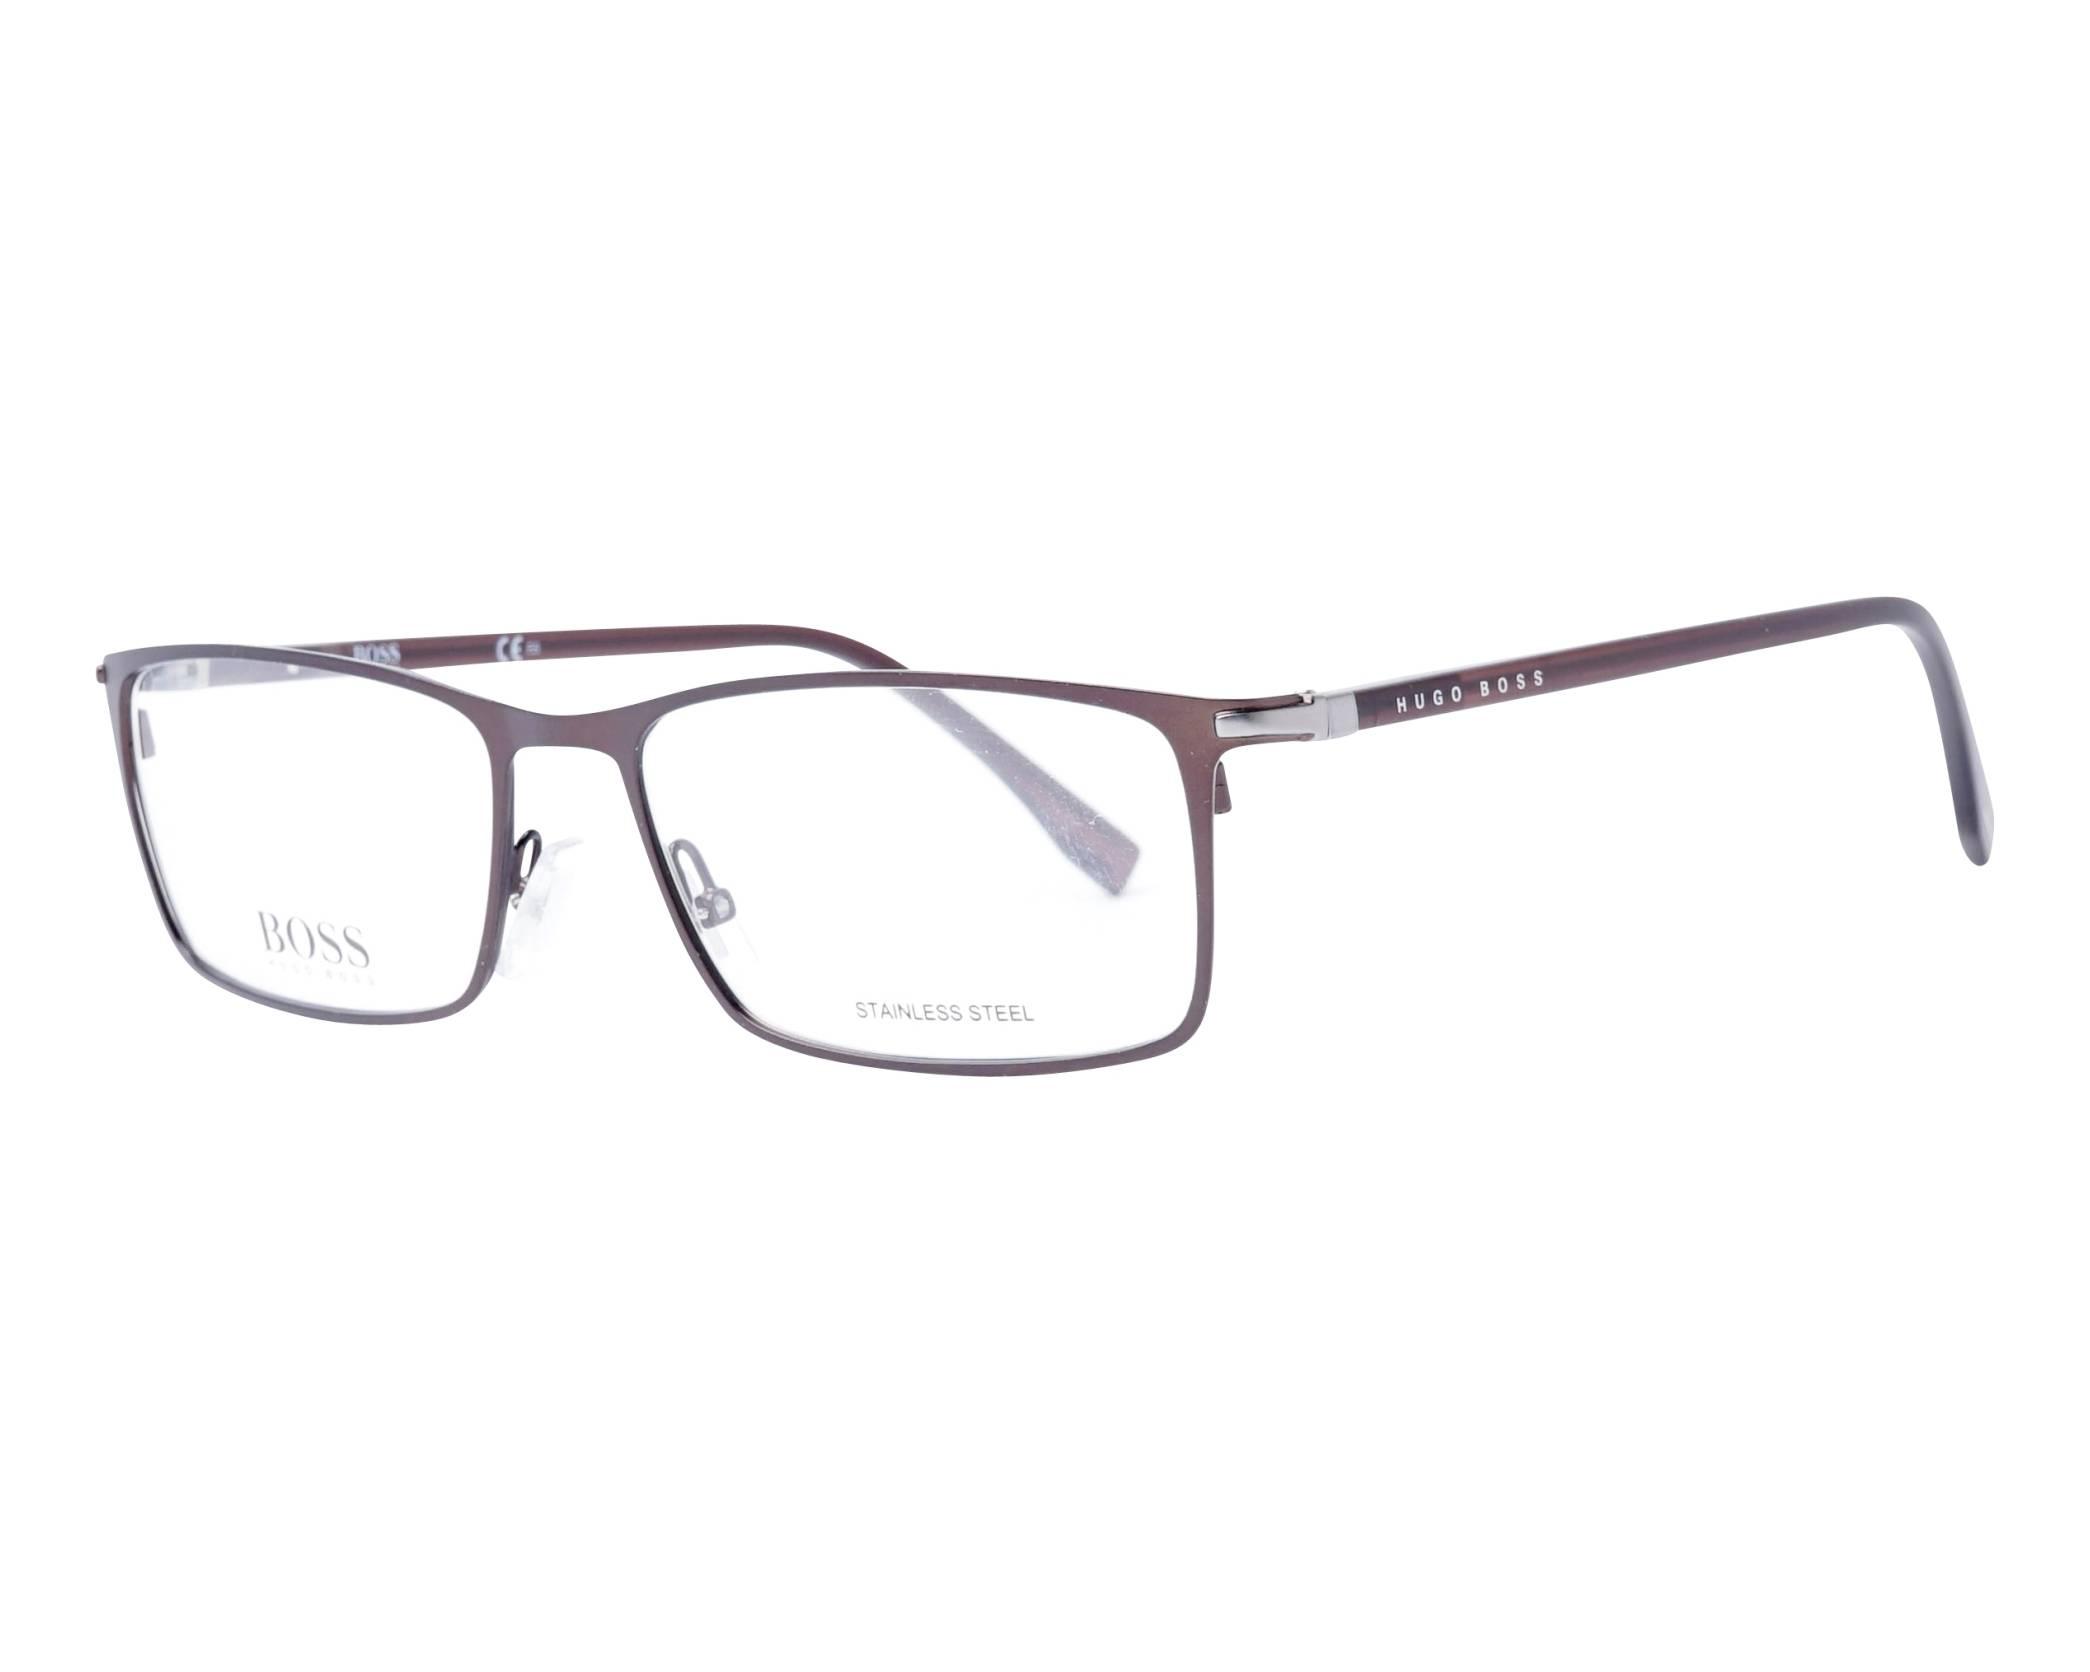 4acd8fcc0983 eyeglasses Hugo Boss BOSS-1006 4IN 57-17 Brown profile view